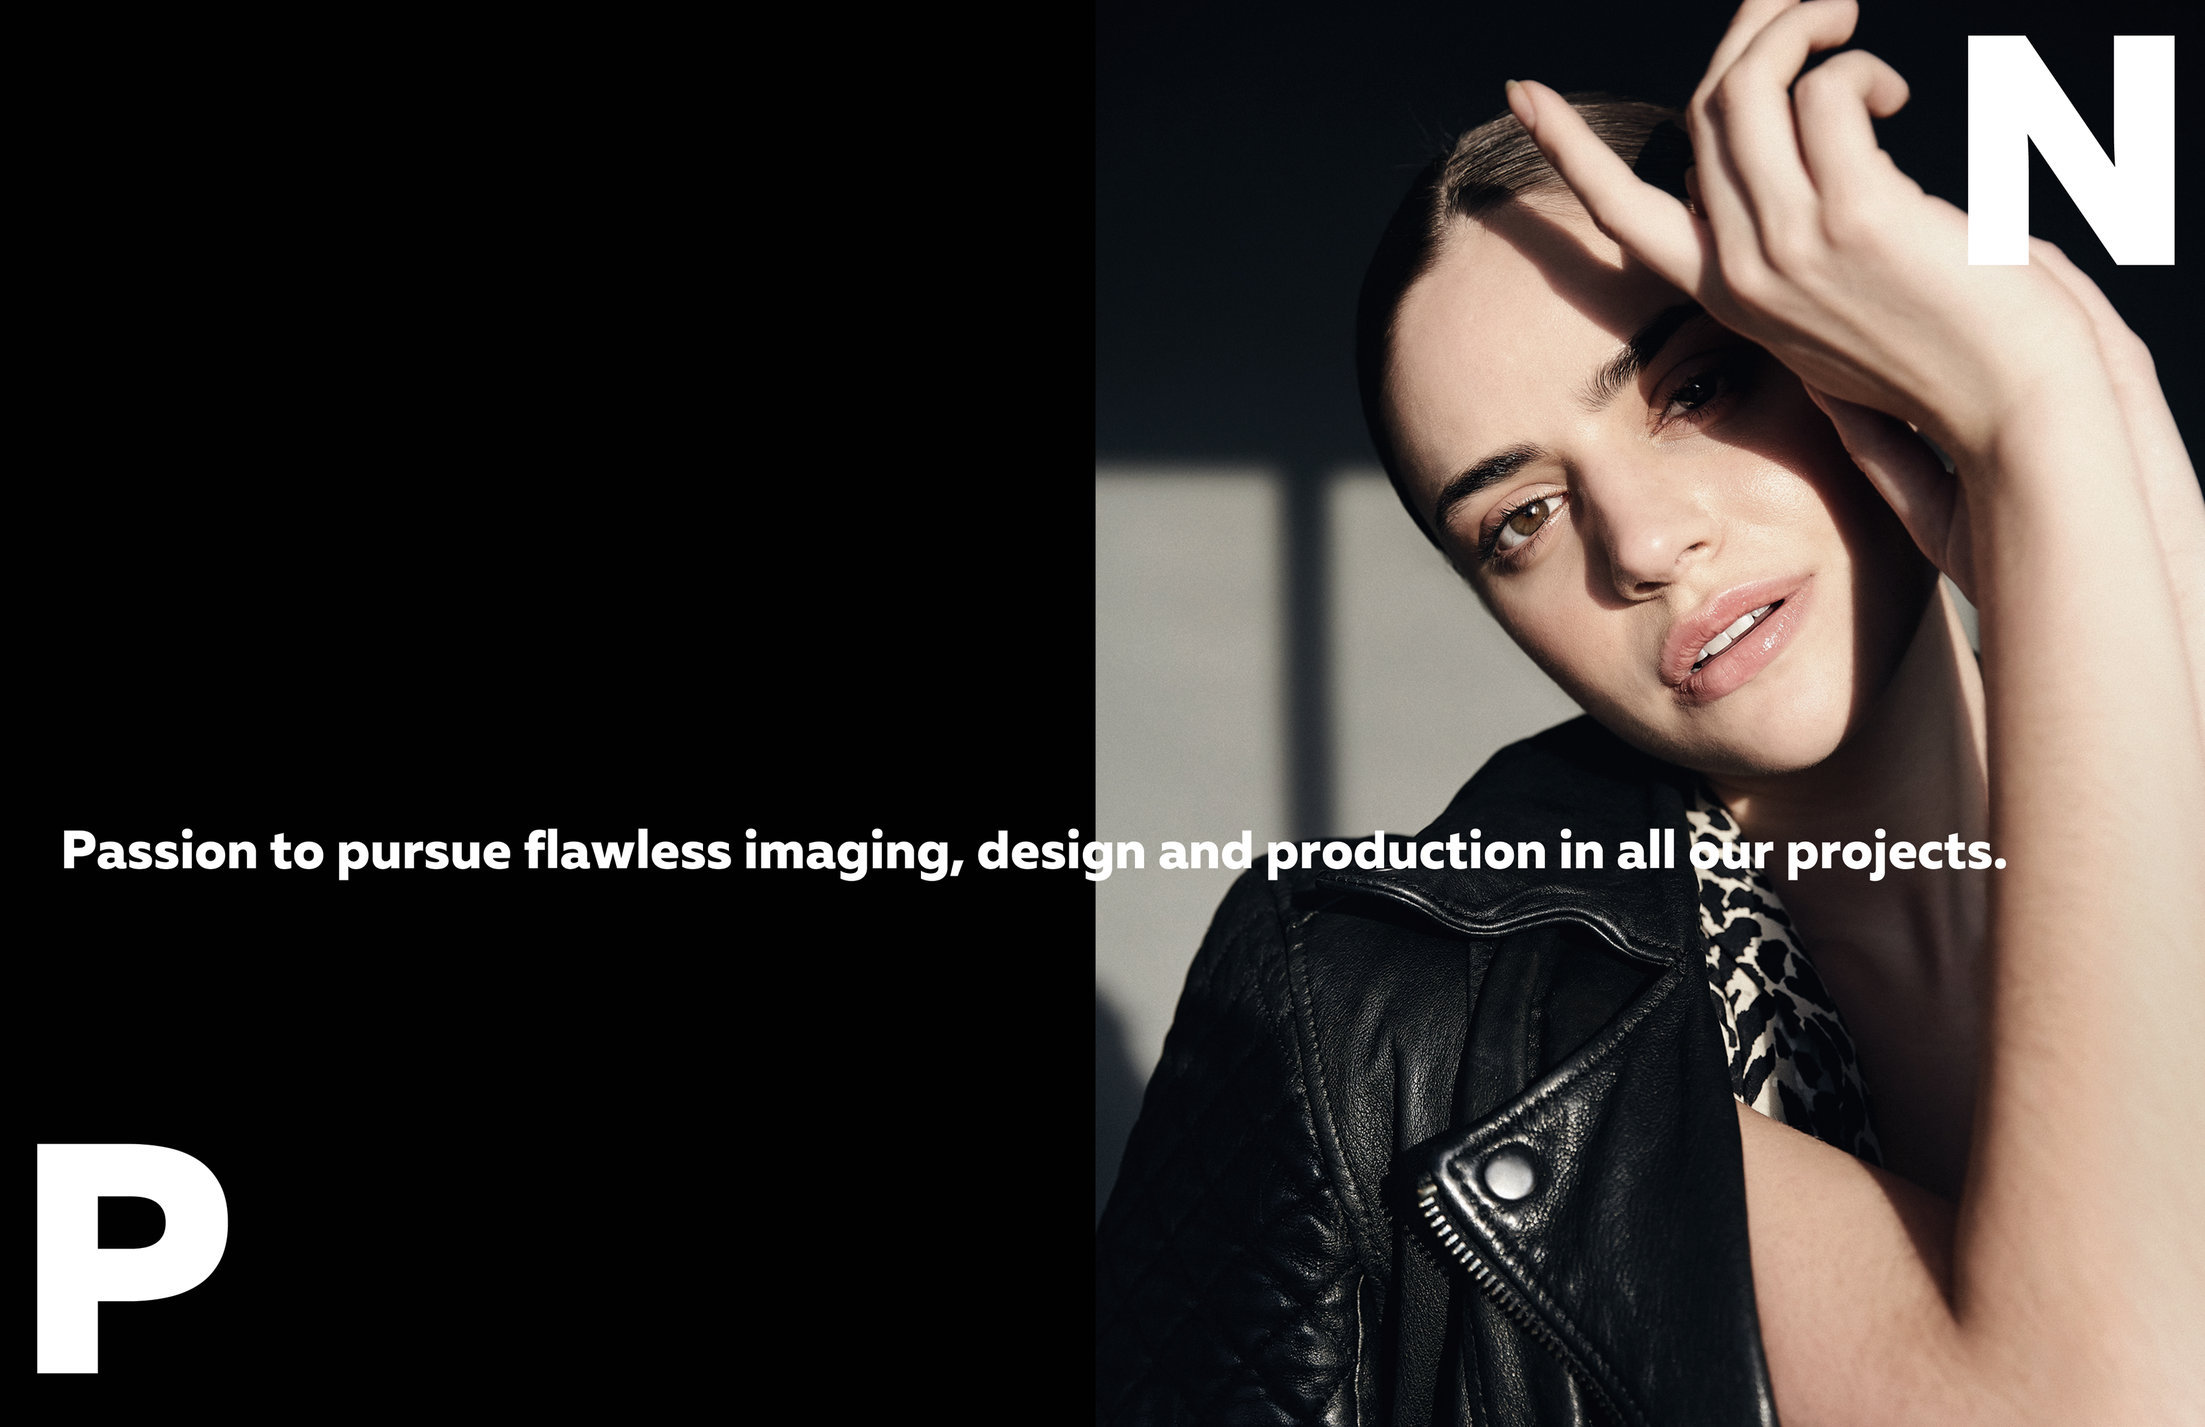 paula_das-nyc_fashion-photographer-nico-stipcianos-miami-copy-2.jpg